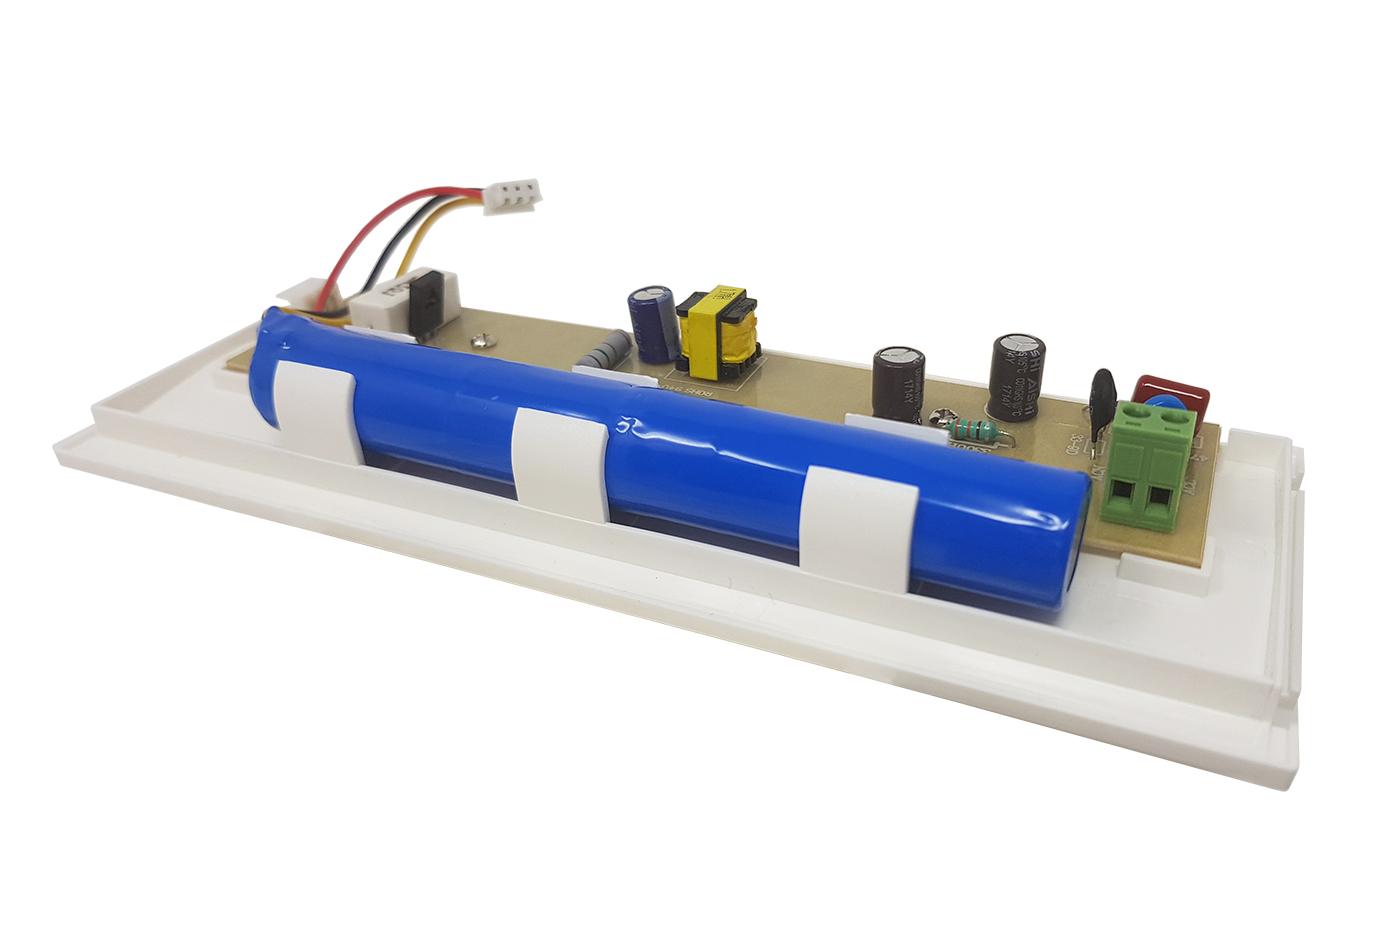 Plafoniere Con Luce Di Emergenza : Bes lampade emergenza beselettronica lampada